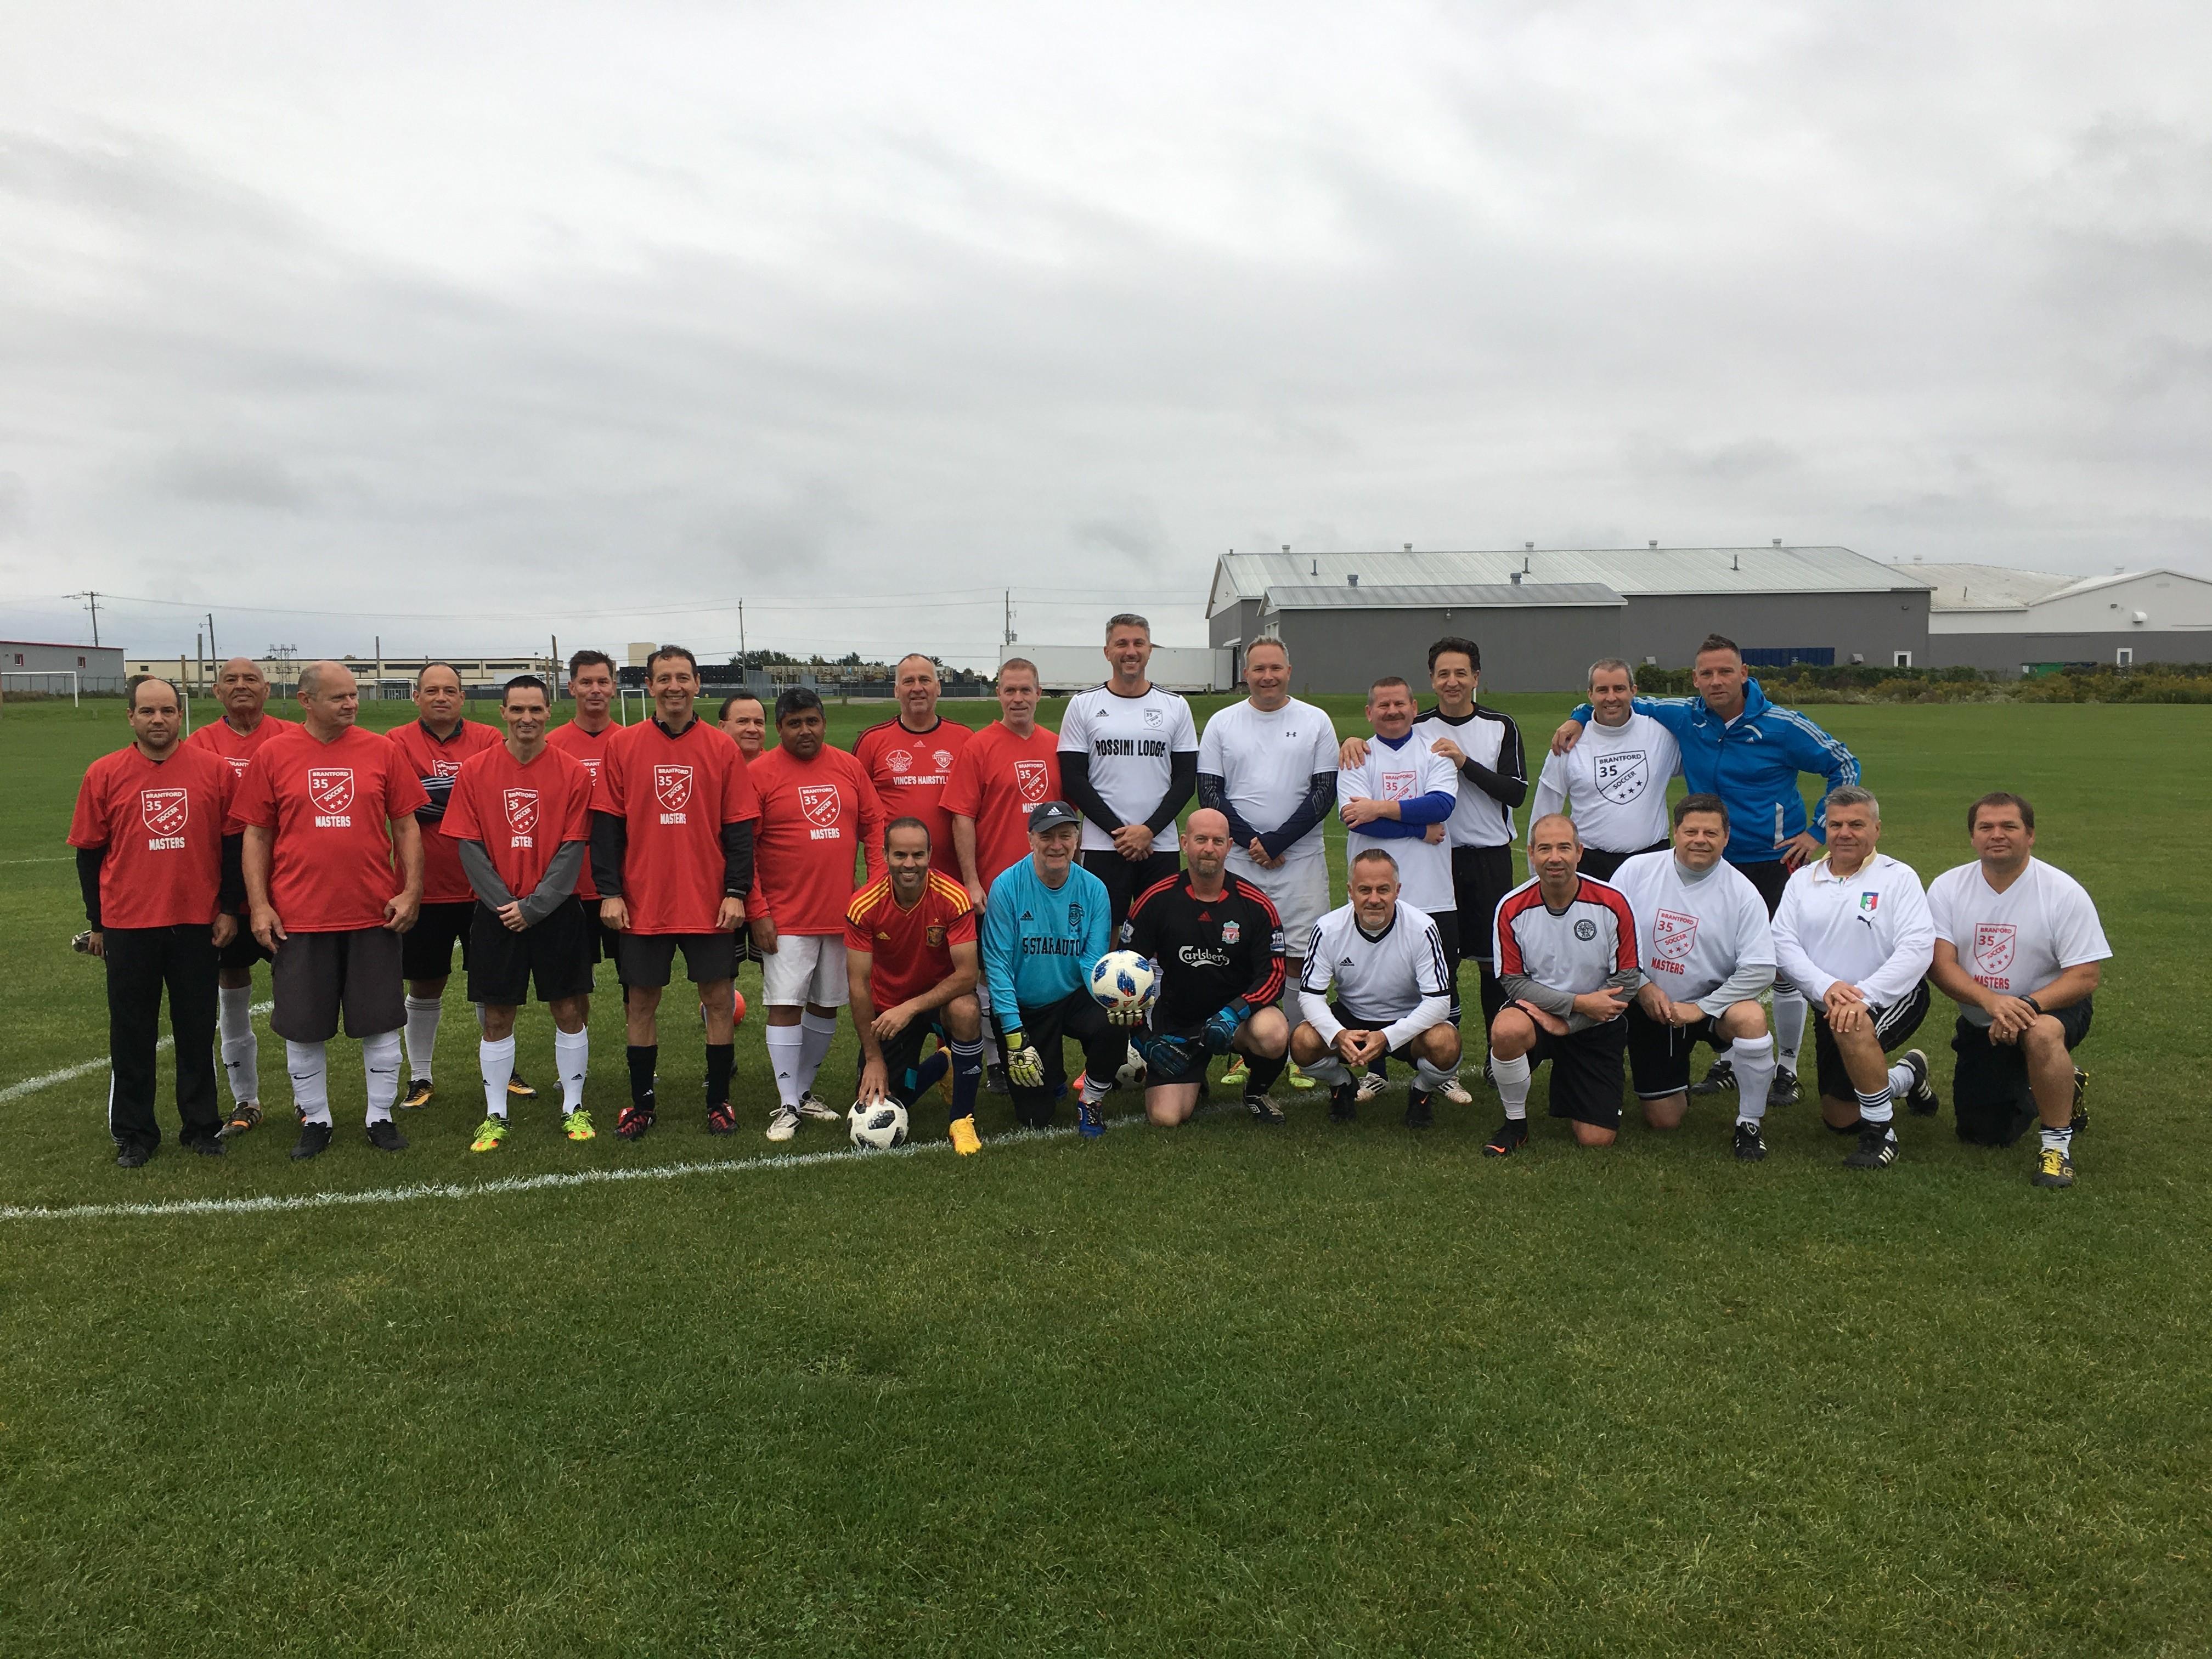 2018 Convenor's Cup